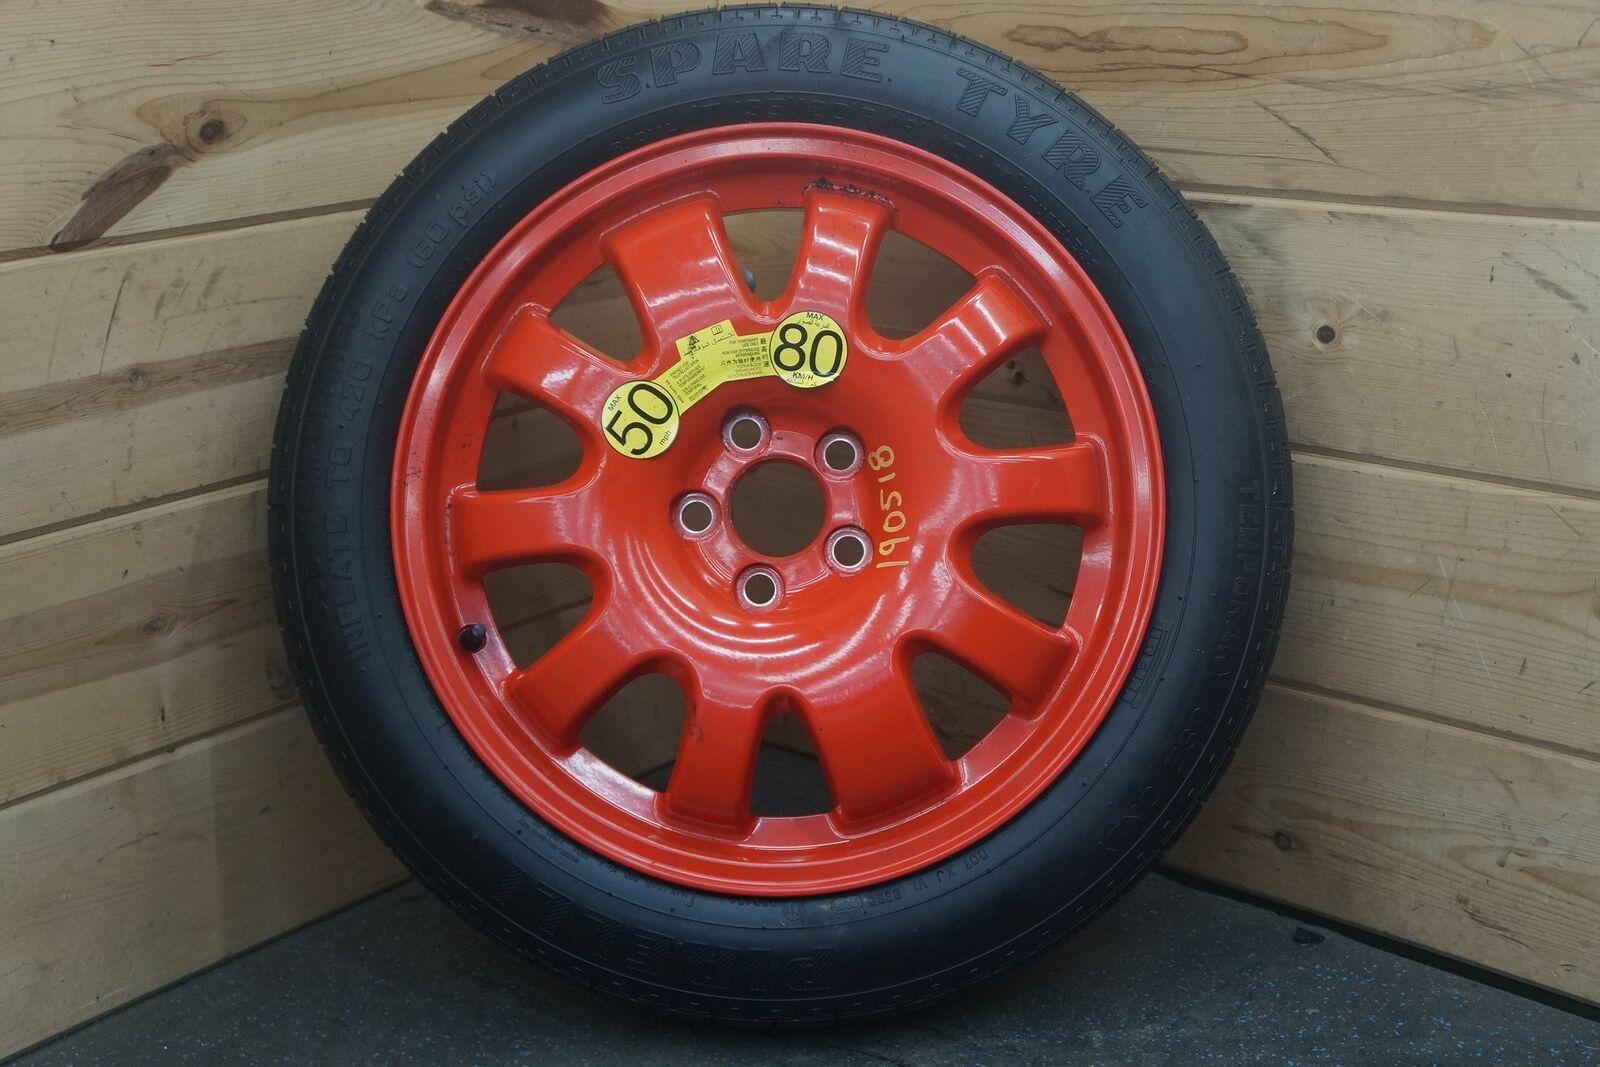 18 Inch Rims And Tires >> Emergency Spare Wheel 18 Inch Rim Pirelli Tire C2c18570 Oem Jaguar Xj 2008 18